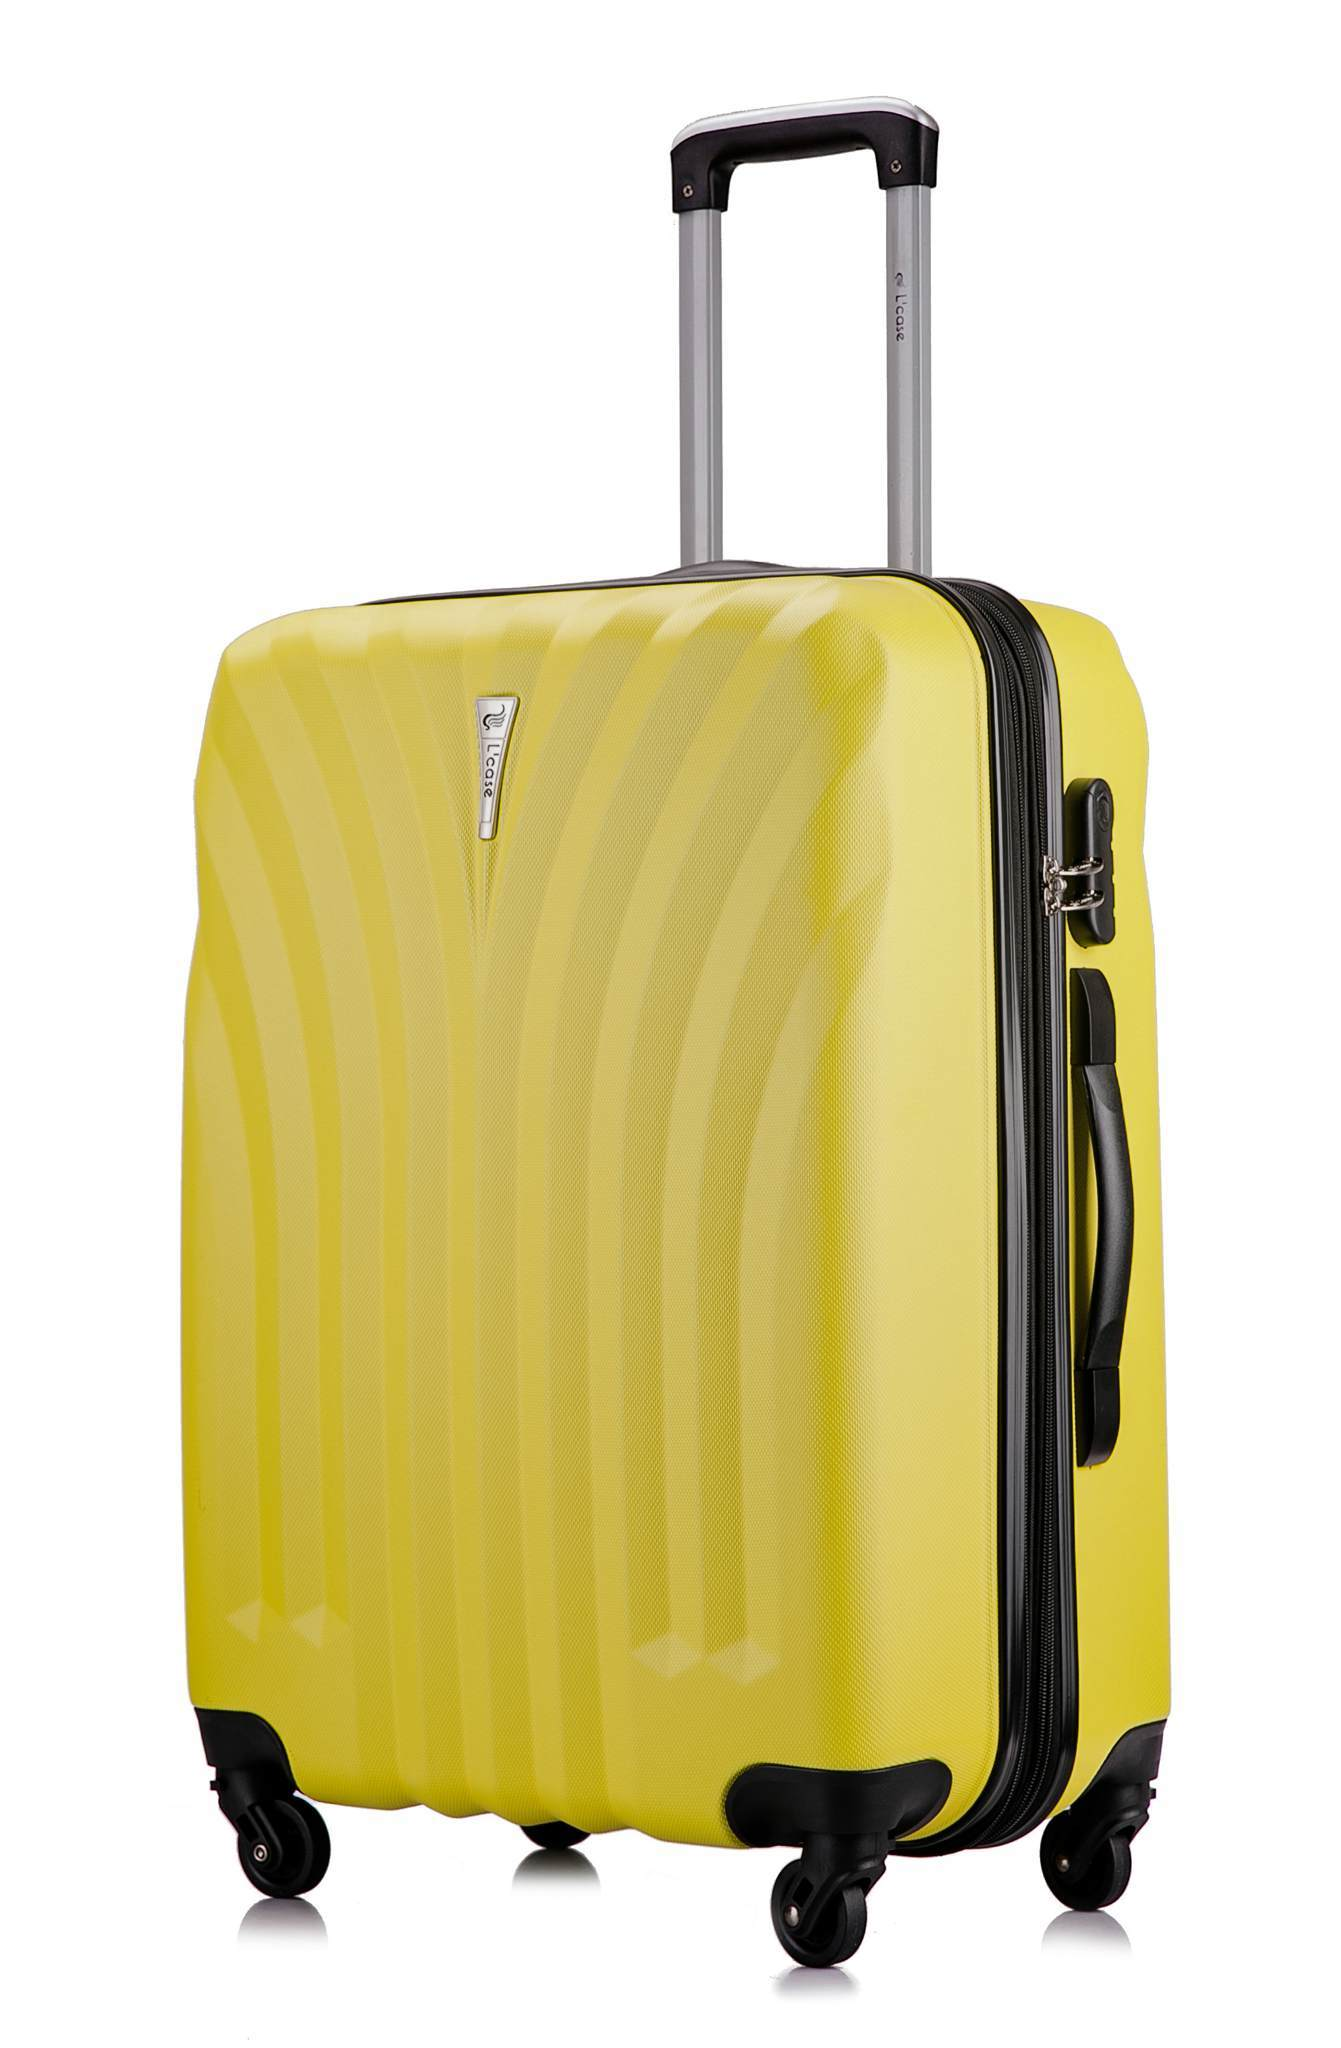 Чемодан с расширением L'case Phuket-24 Желтый (M+)